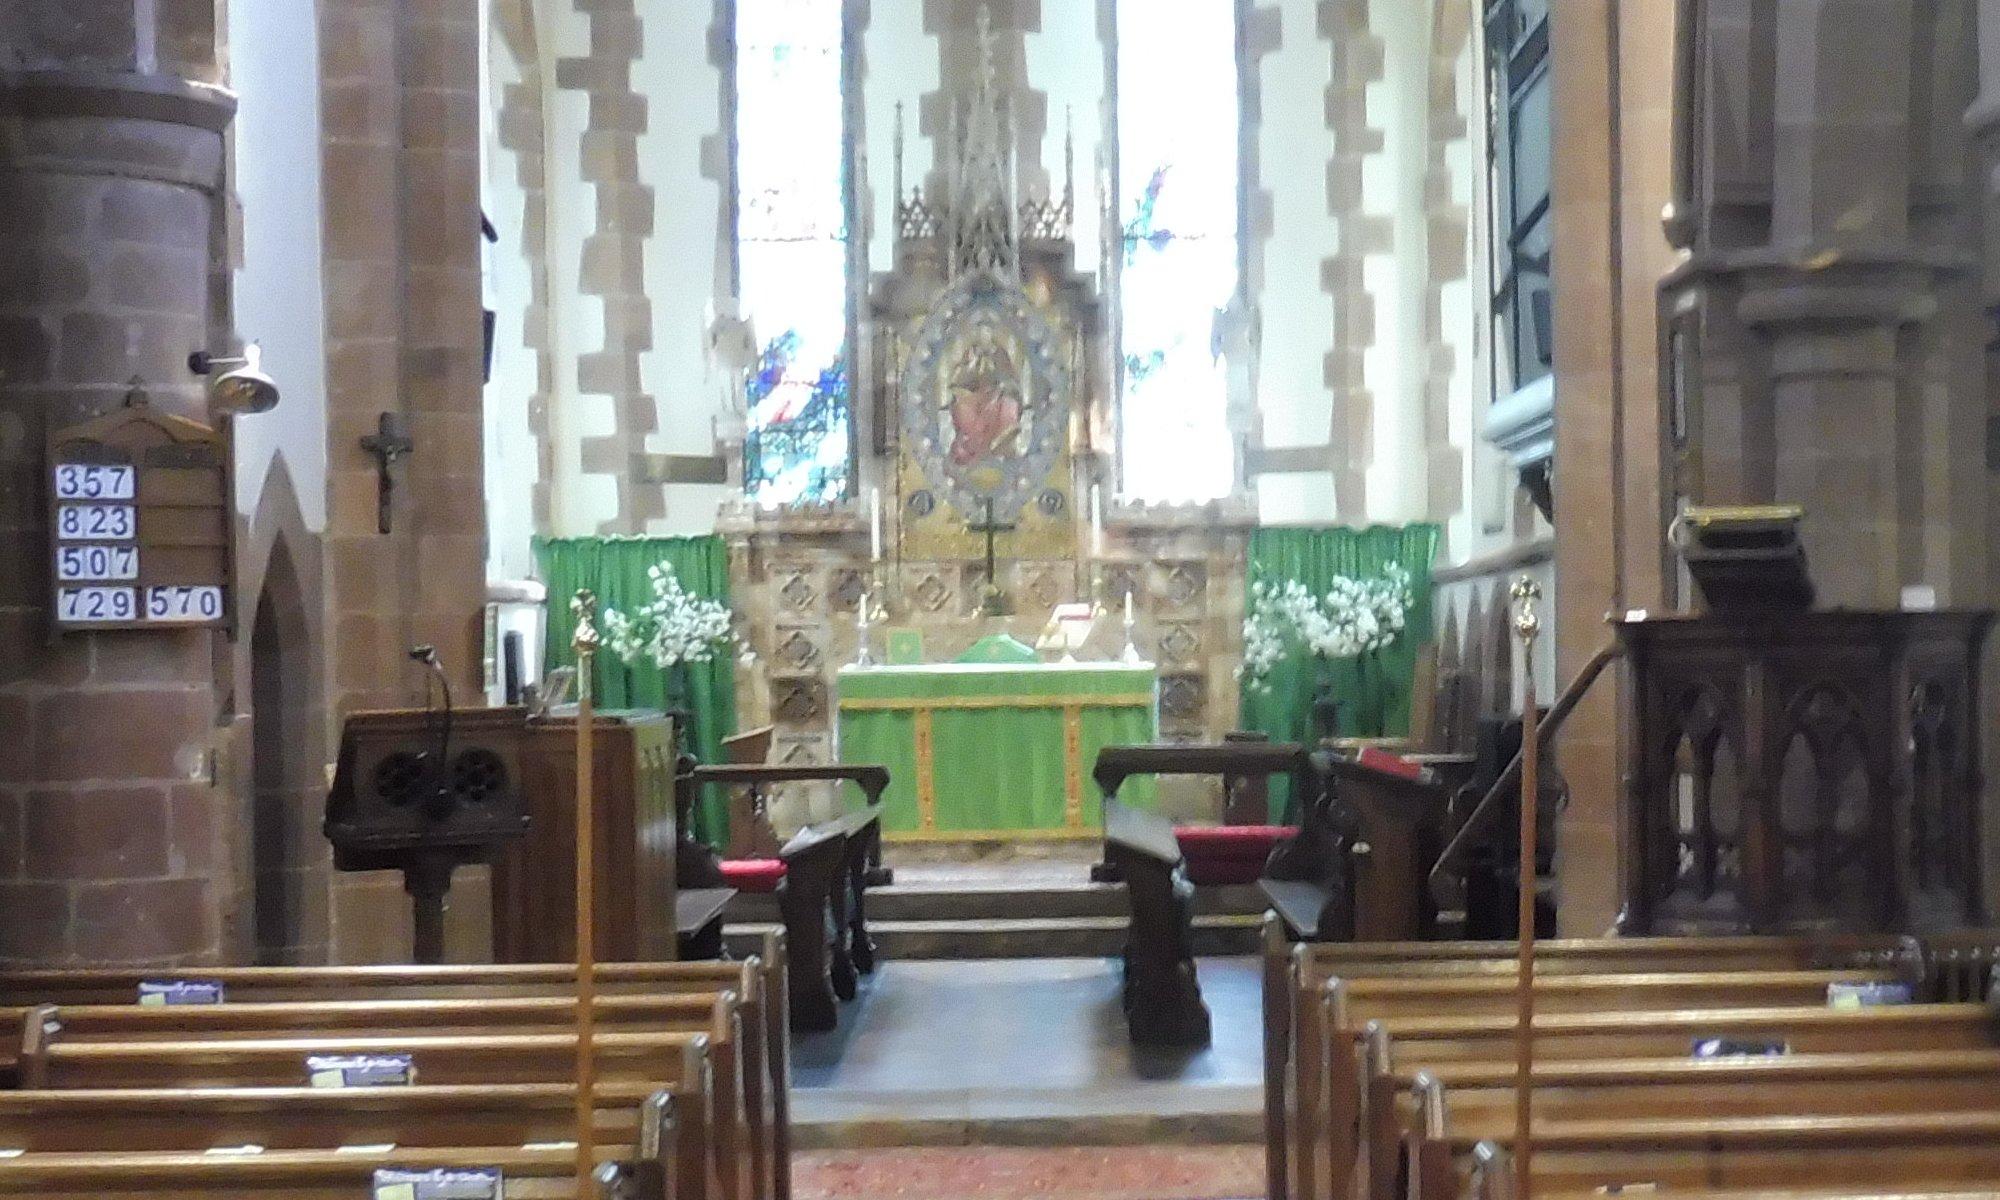 Pattingham church